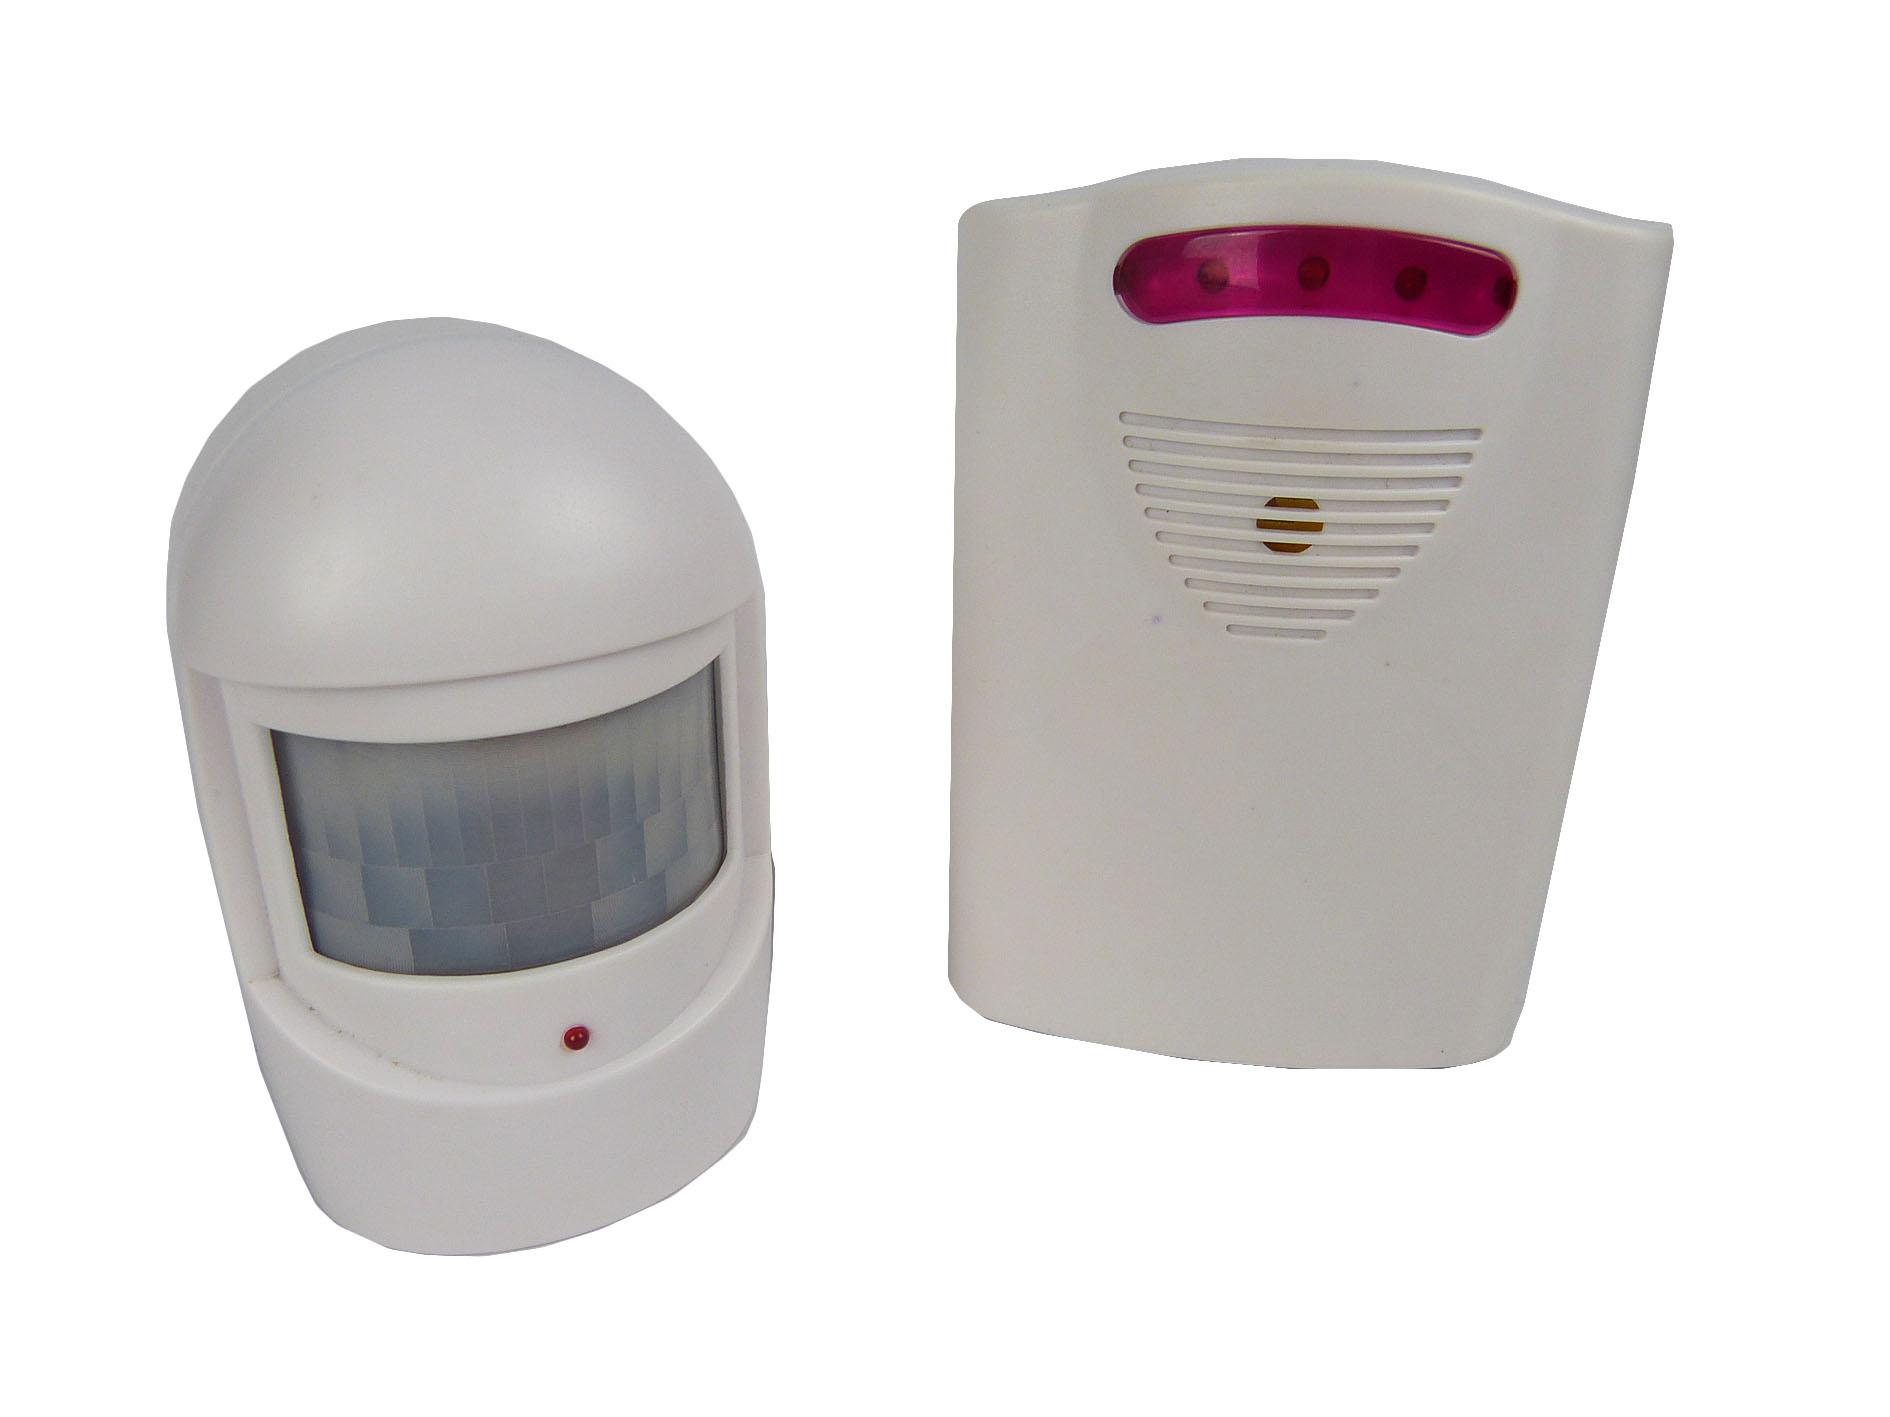 driveway alarm wireless pir motion sensor alarm